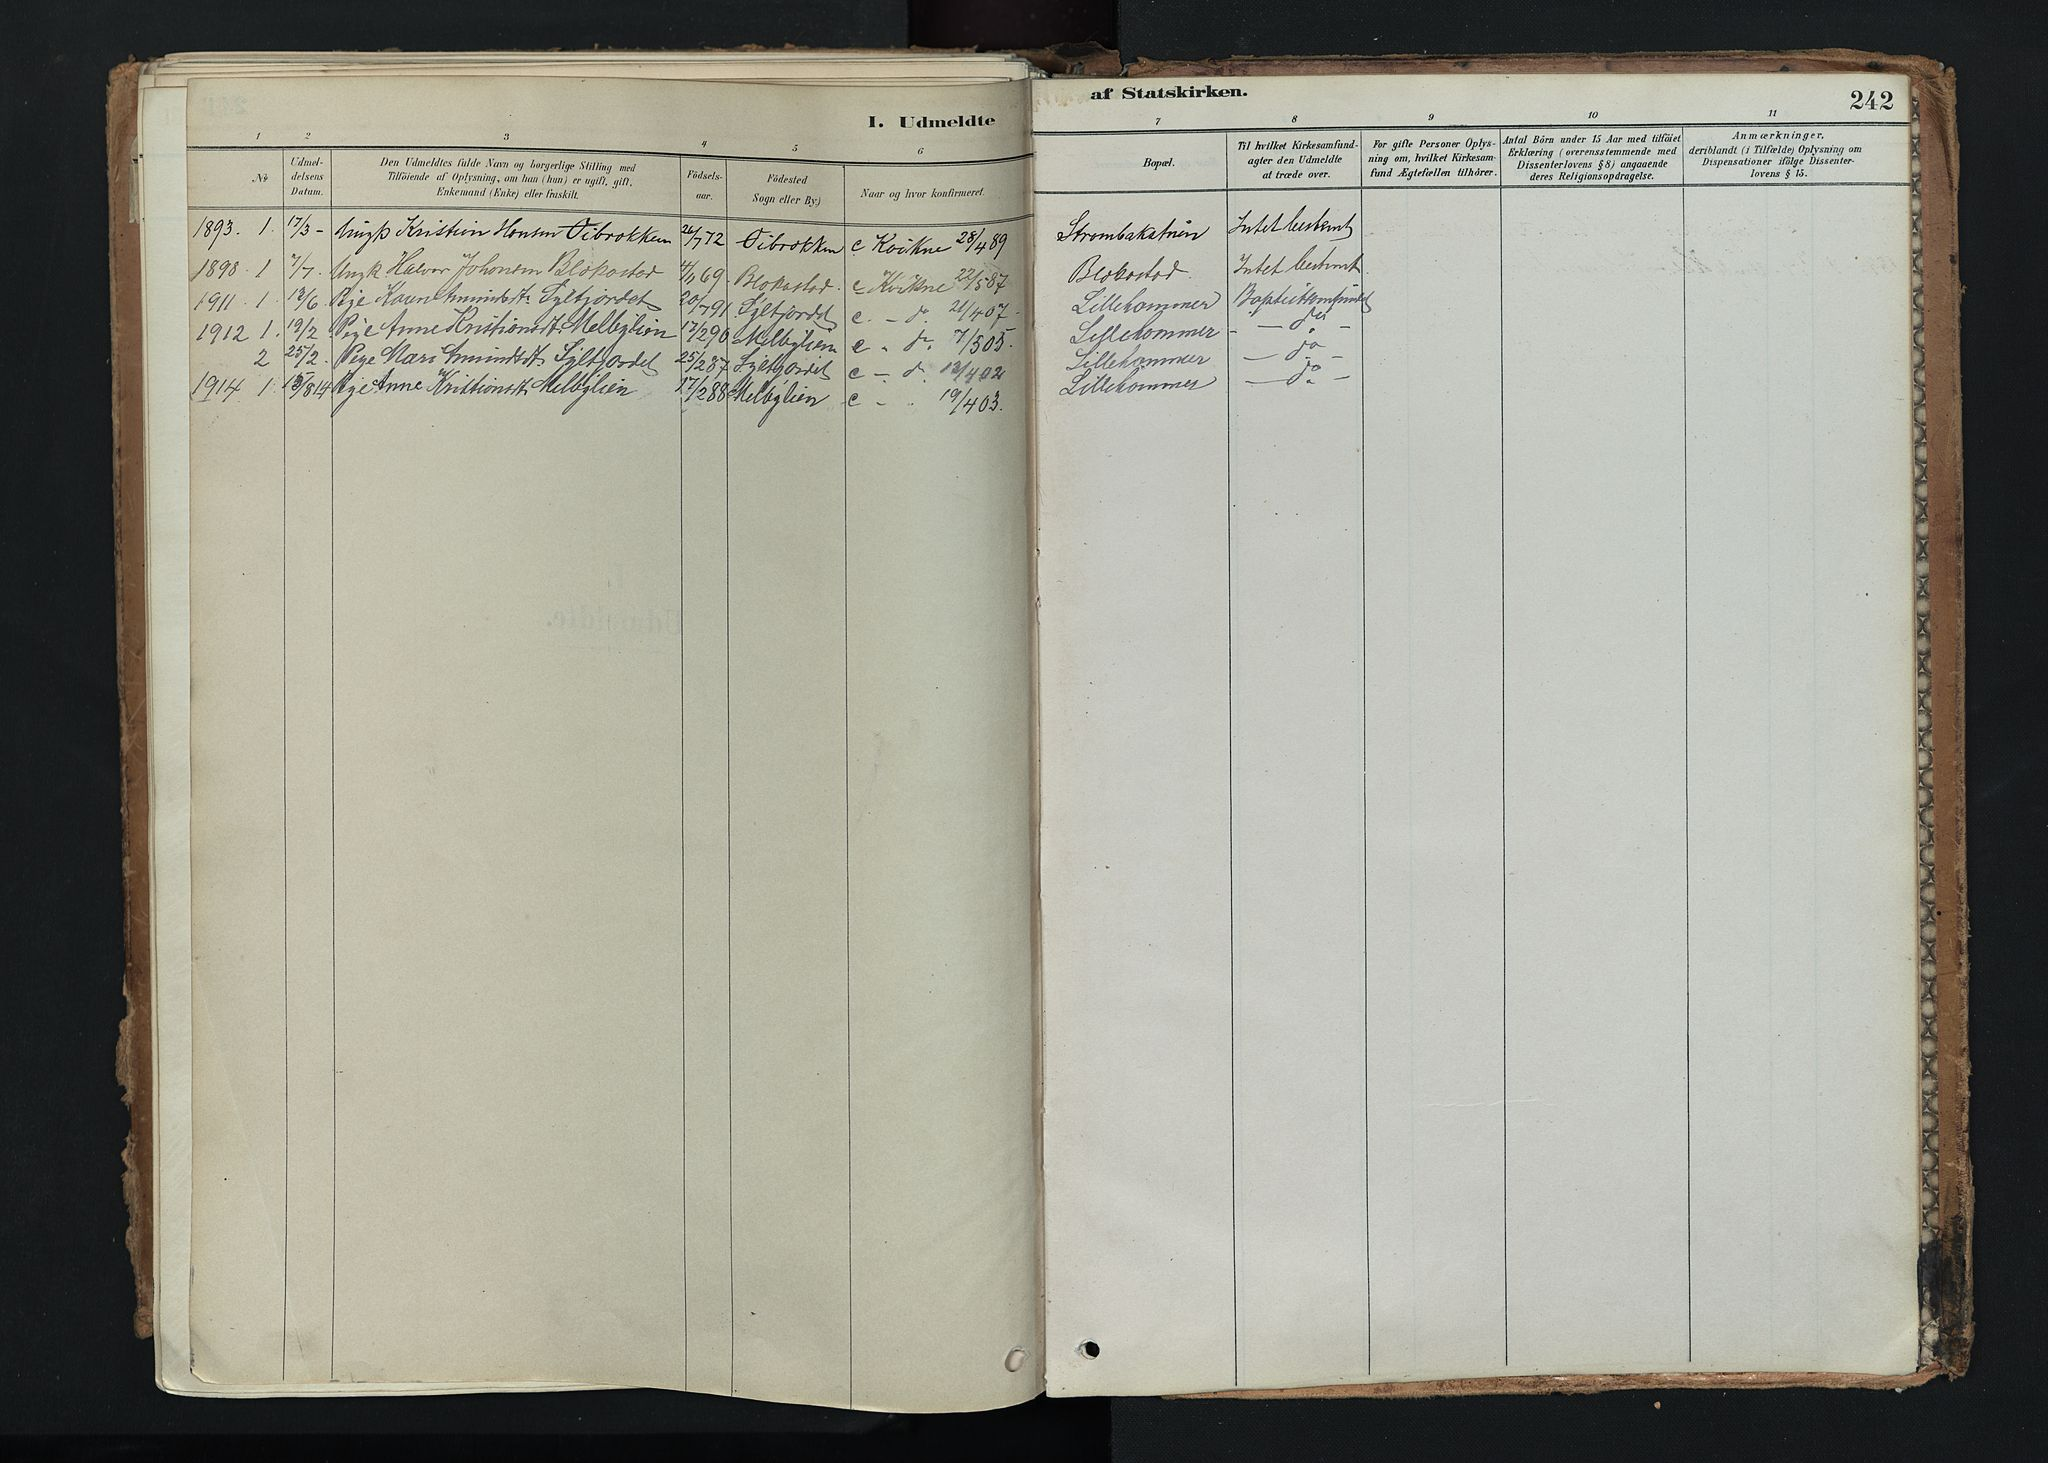 SAH, Nord-Fron prestekontor, Ministerialbok nr. 5, 1884-1914, s. 242